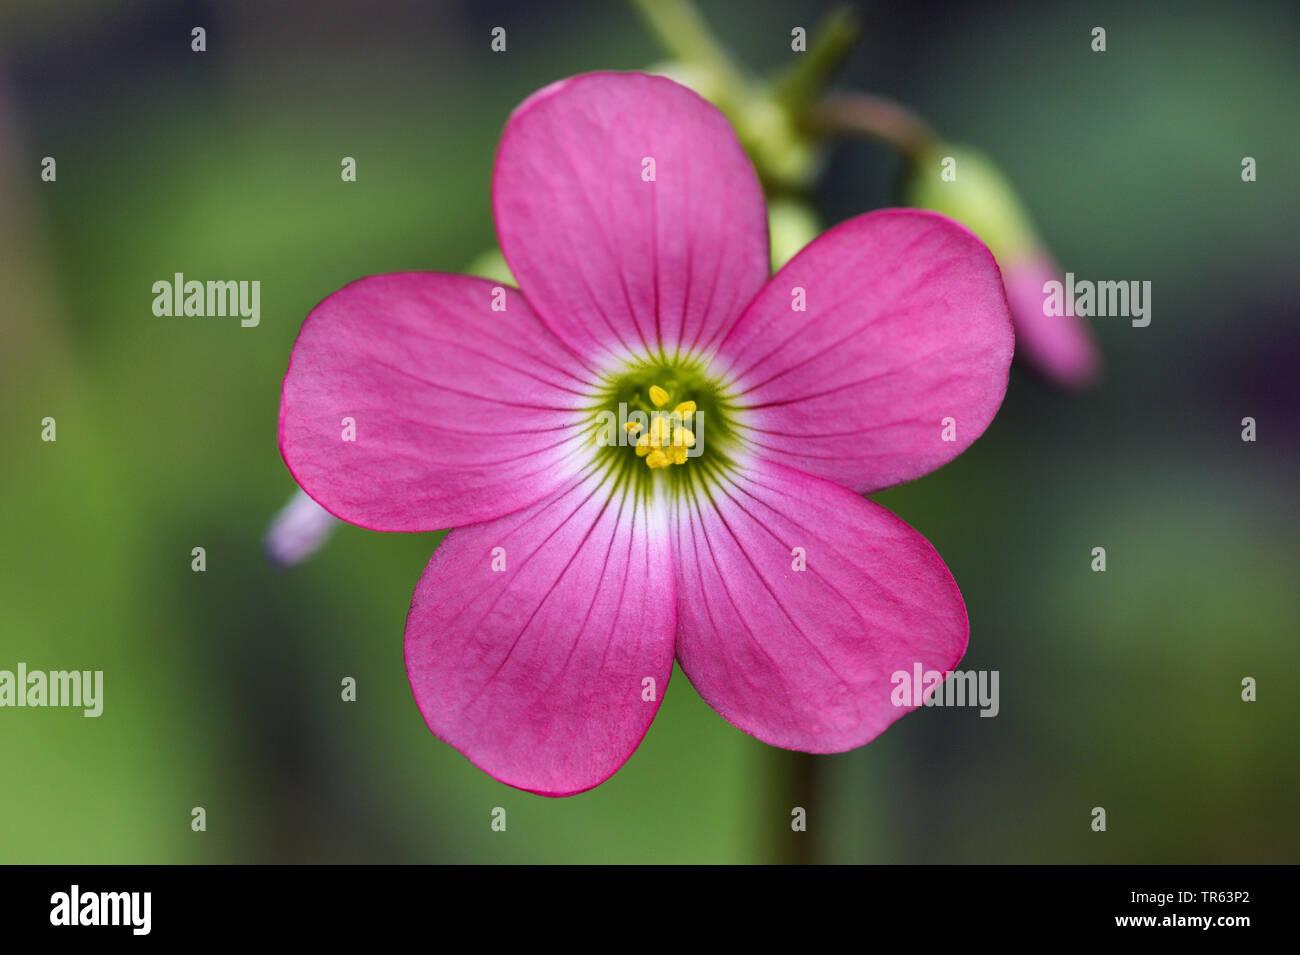 four-leafed clover (Oxalis tetraphylla 'Iron Cross', Oxalis tetraphylla Iron Cross, Oxalis deppei), flower of cultivar Iron Cross Stock Photo